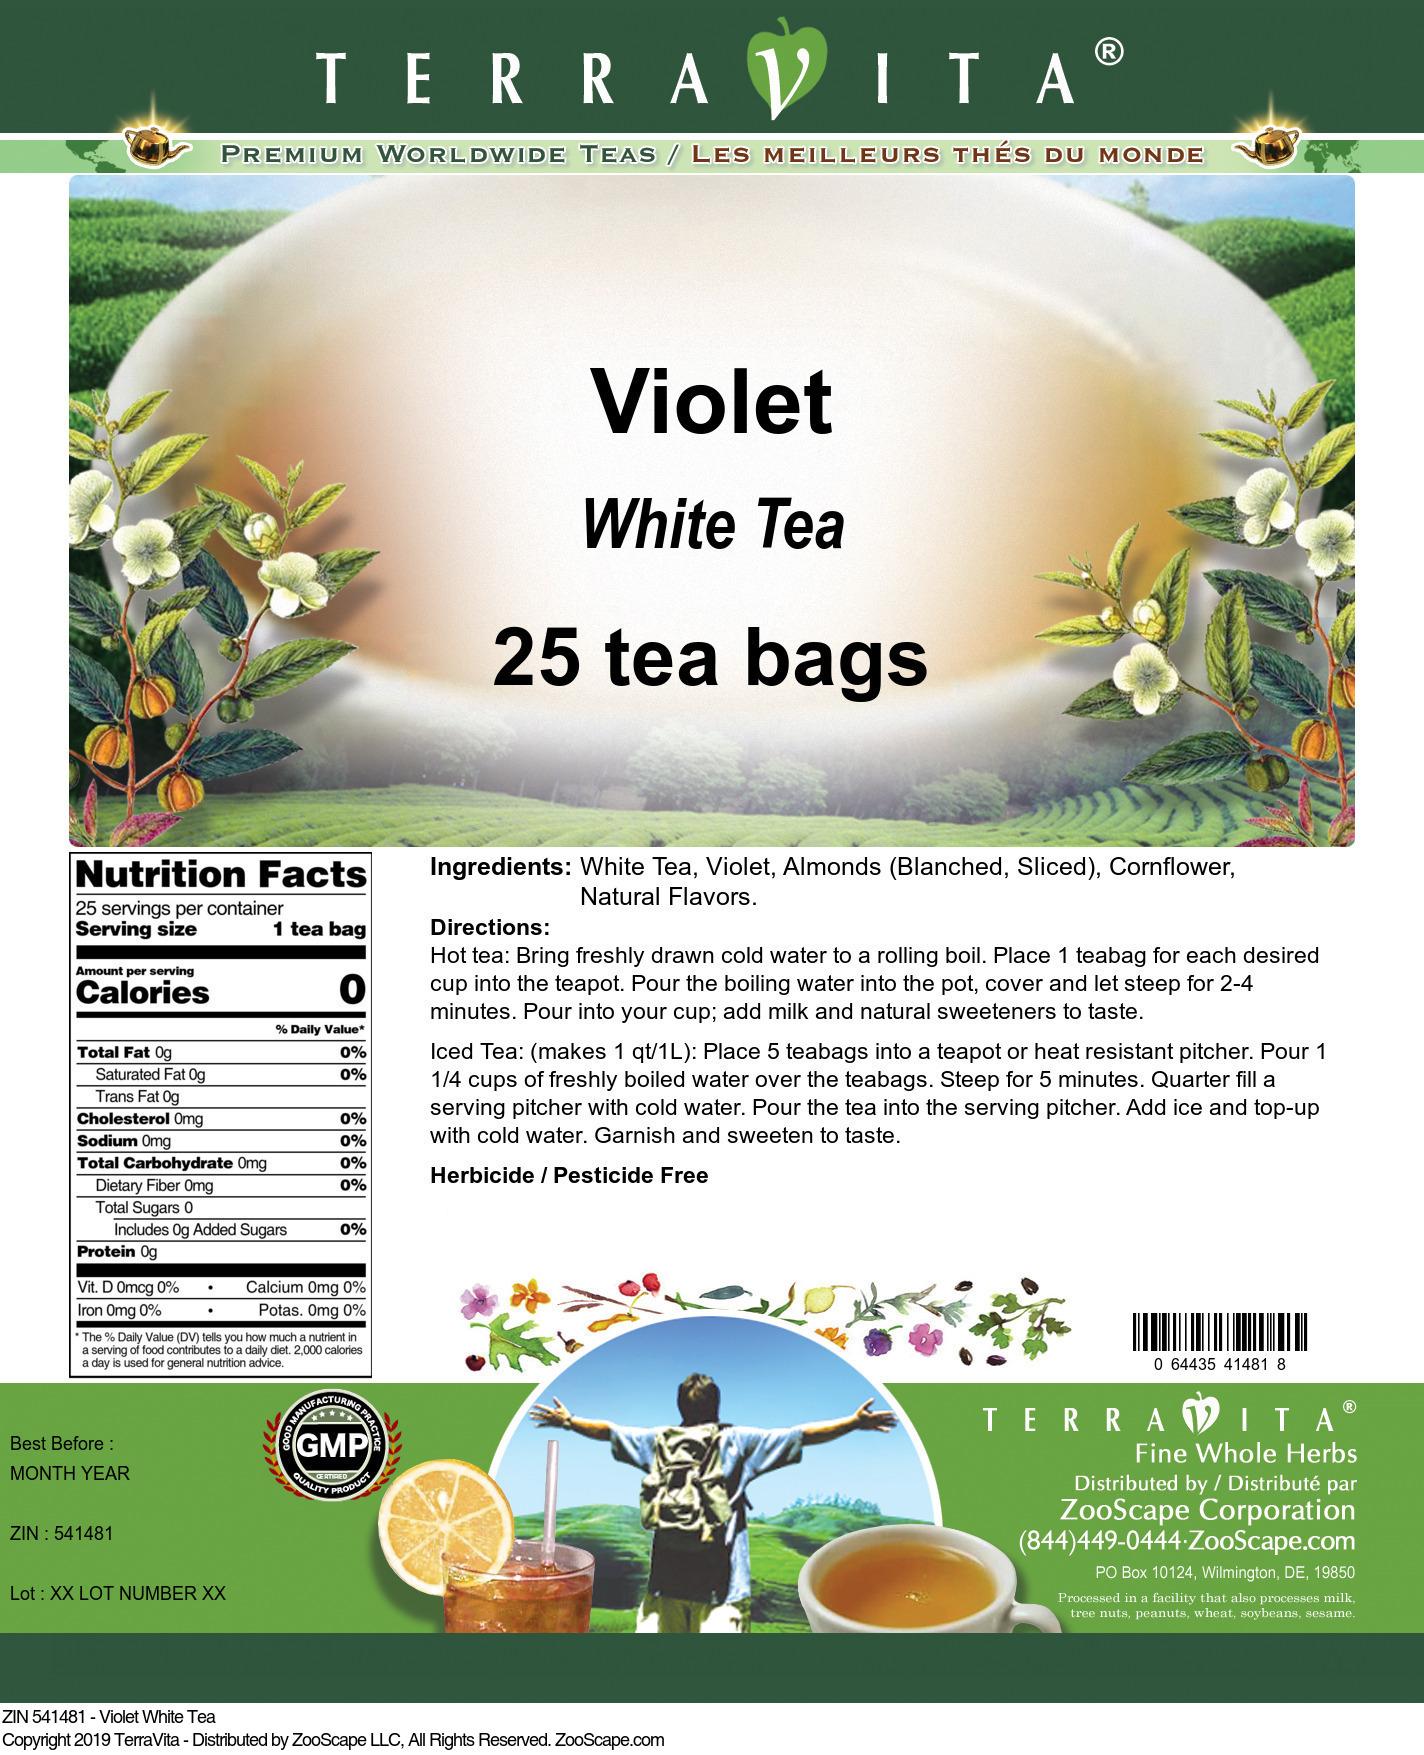 Violet White Tea